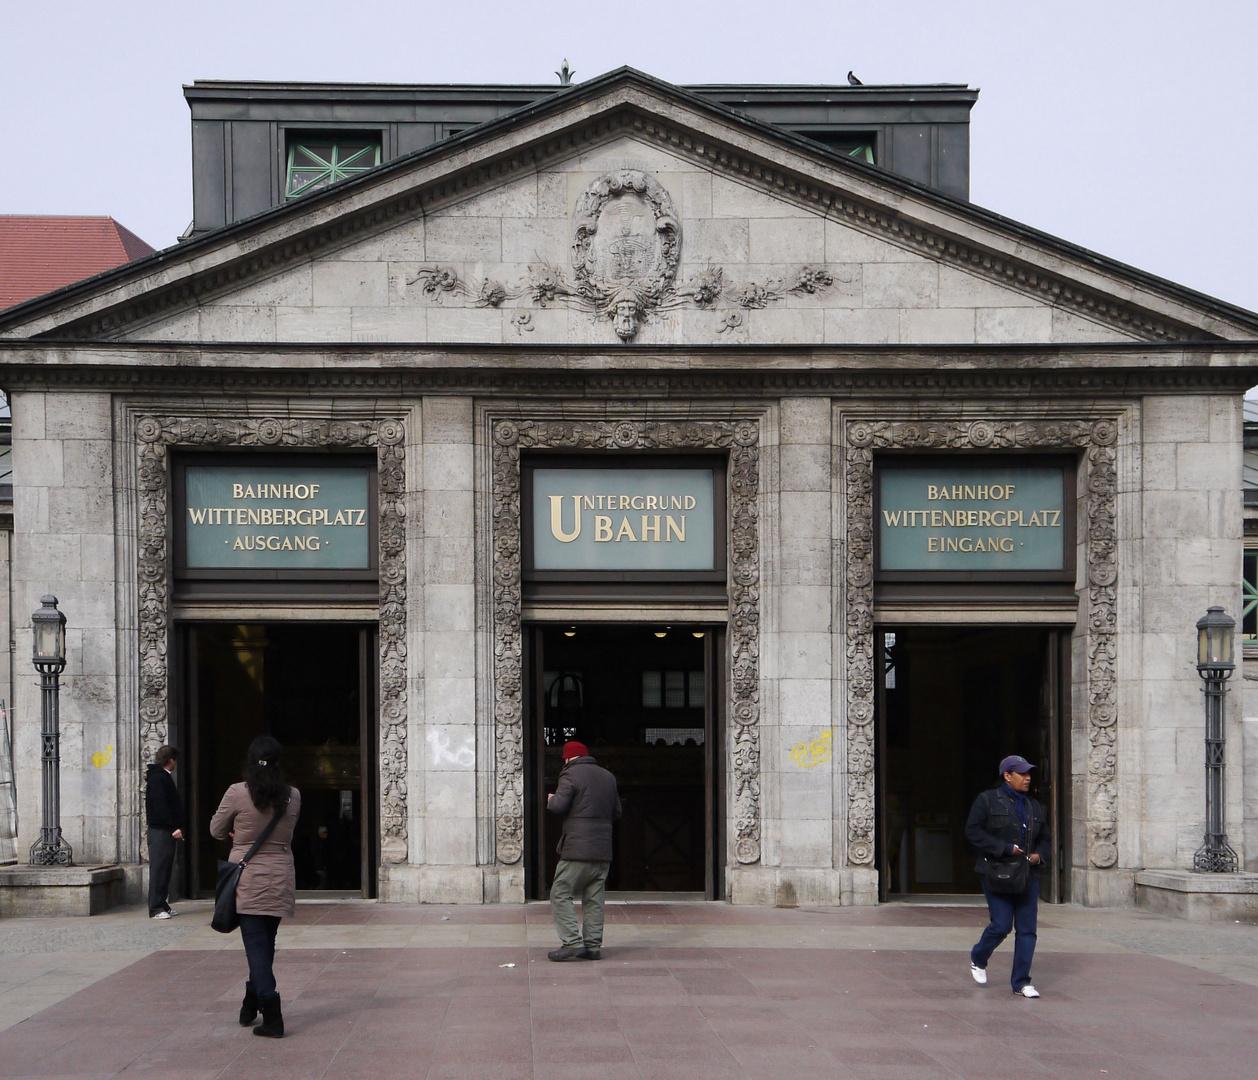 U-Bahnstation Wittenberg-Platz, Berlin